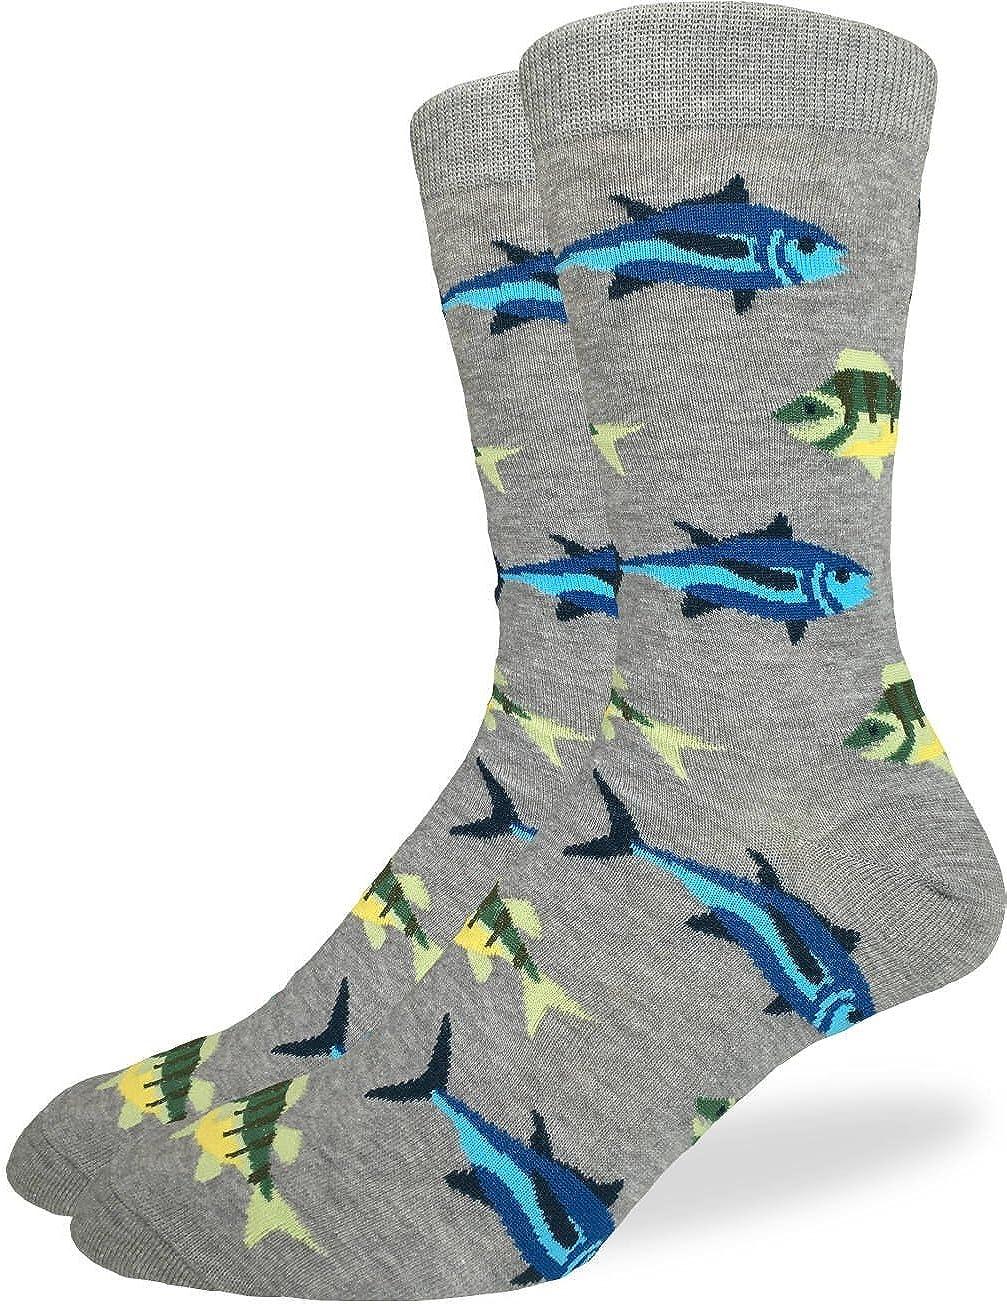 Good Luck Sock Men's Extra Large School of Fish Socks, Size 13-17, Big & Tall